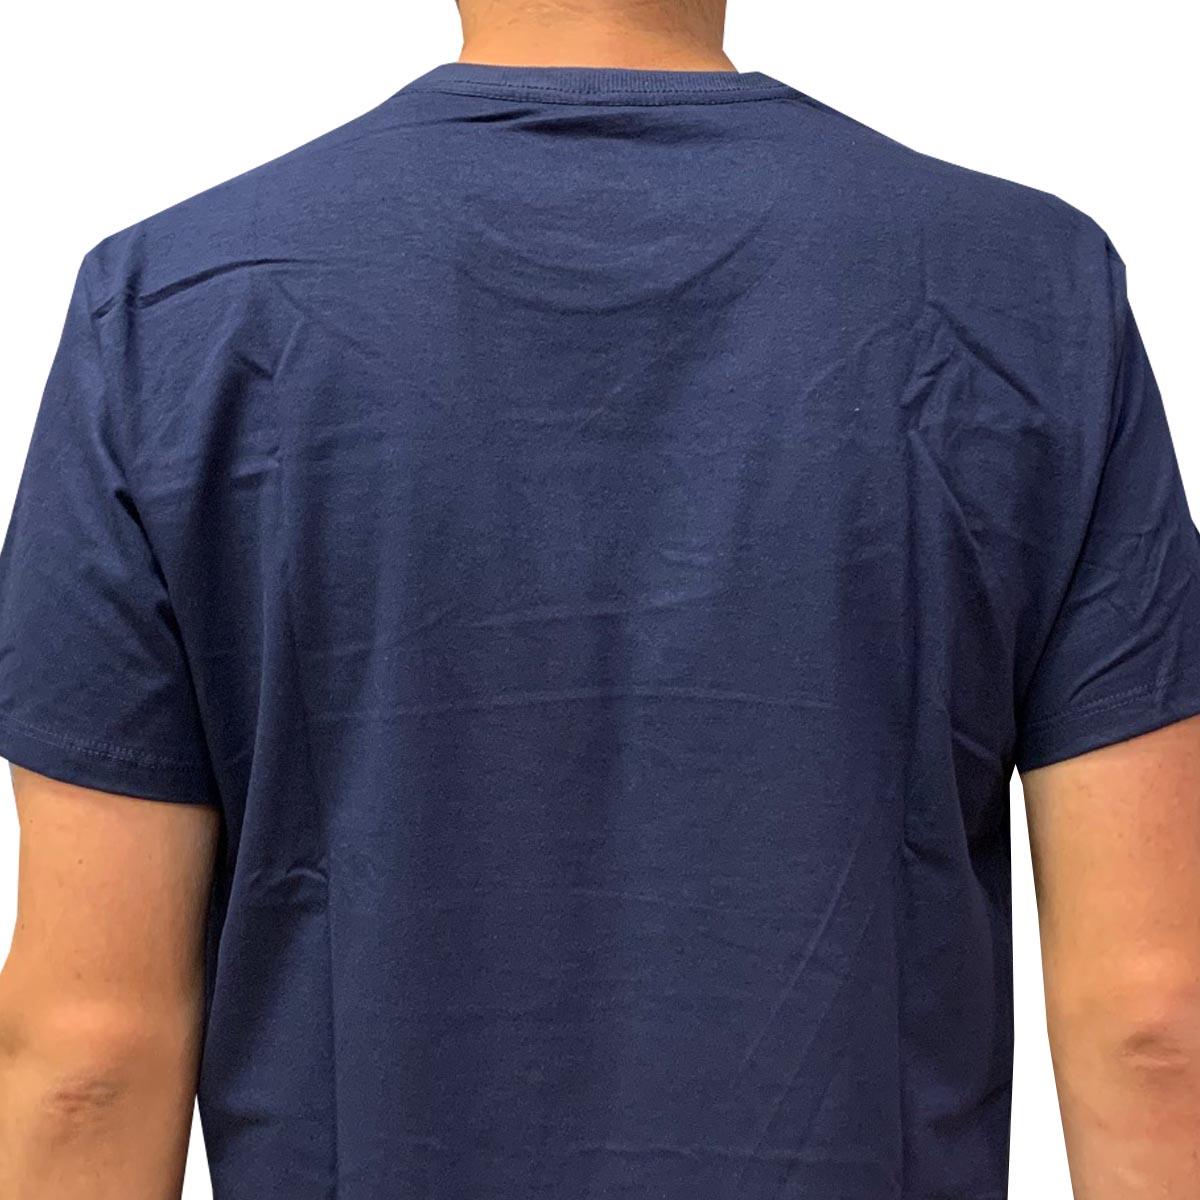 Camiseta Billabong Unitedy Masculina manga curta